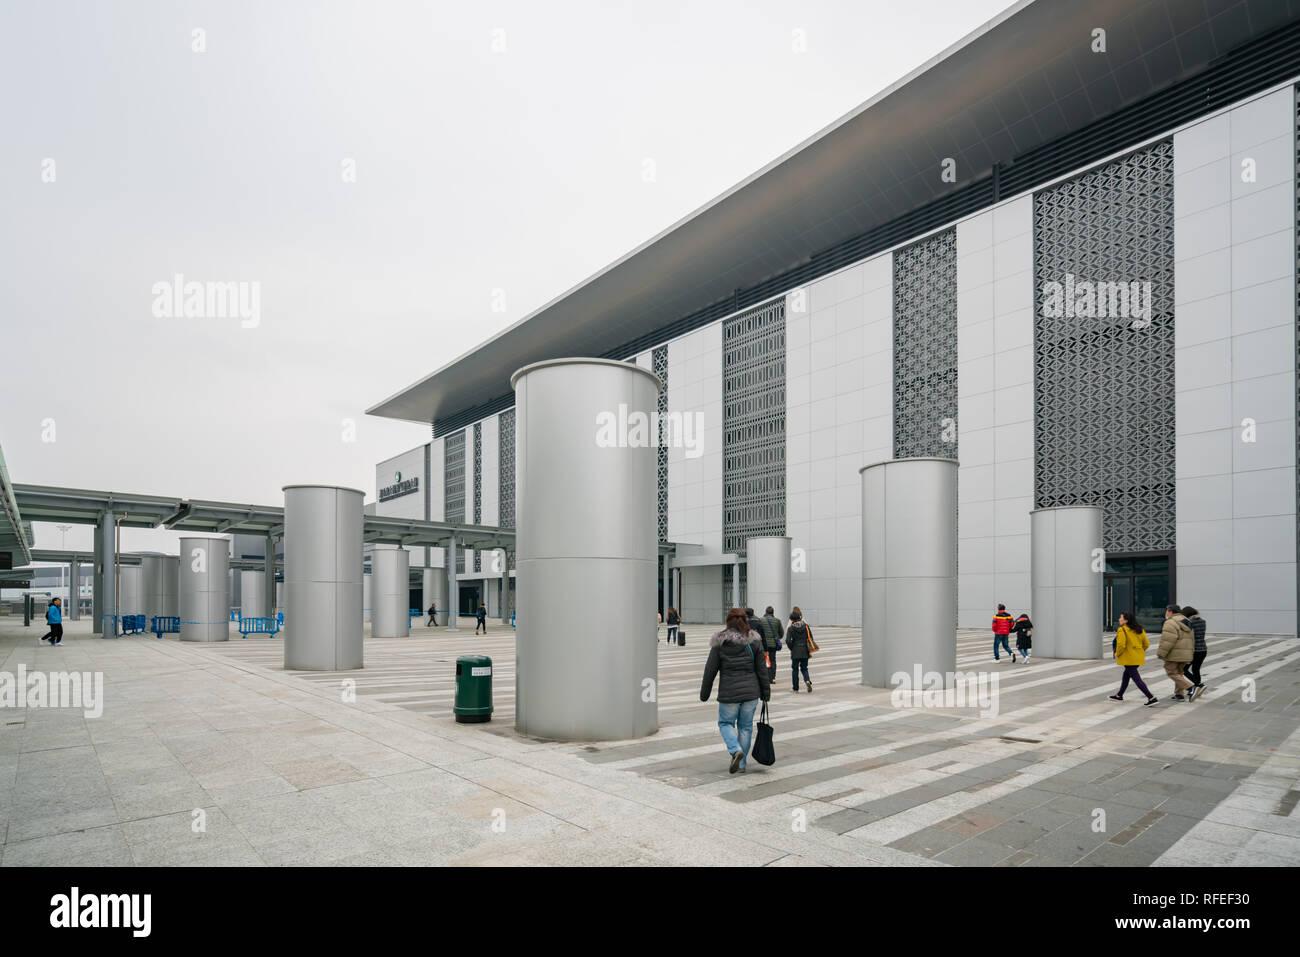 Macau, DEC 31: Exterior view of the Macau Boundary Crossing Facilities on DEC 31, 2018 at Macau - Stock Image